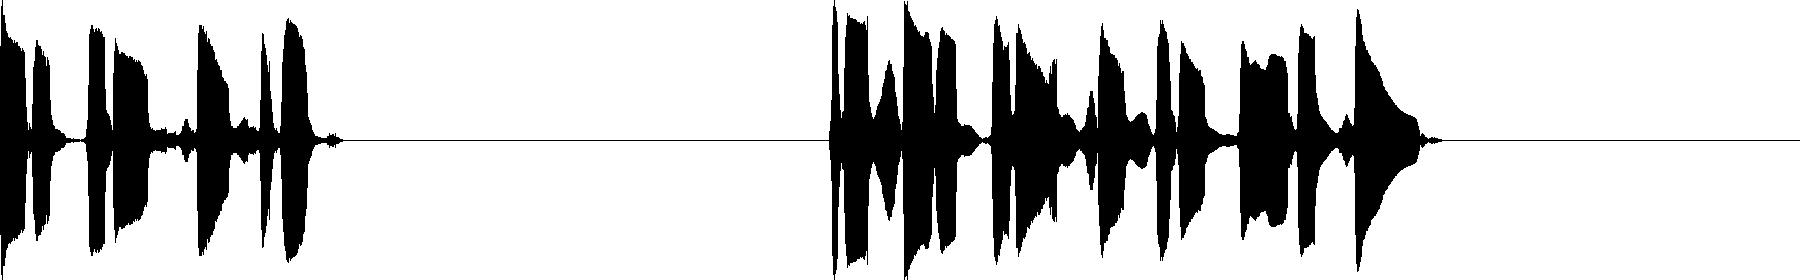 vedh sax lick 01 cm 124bpm